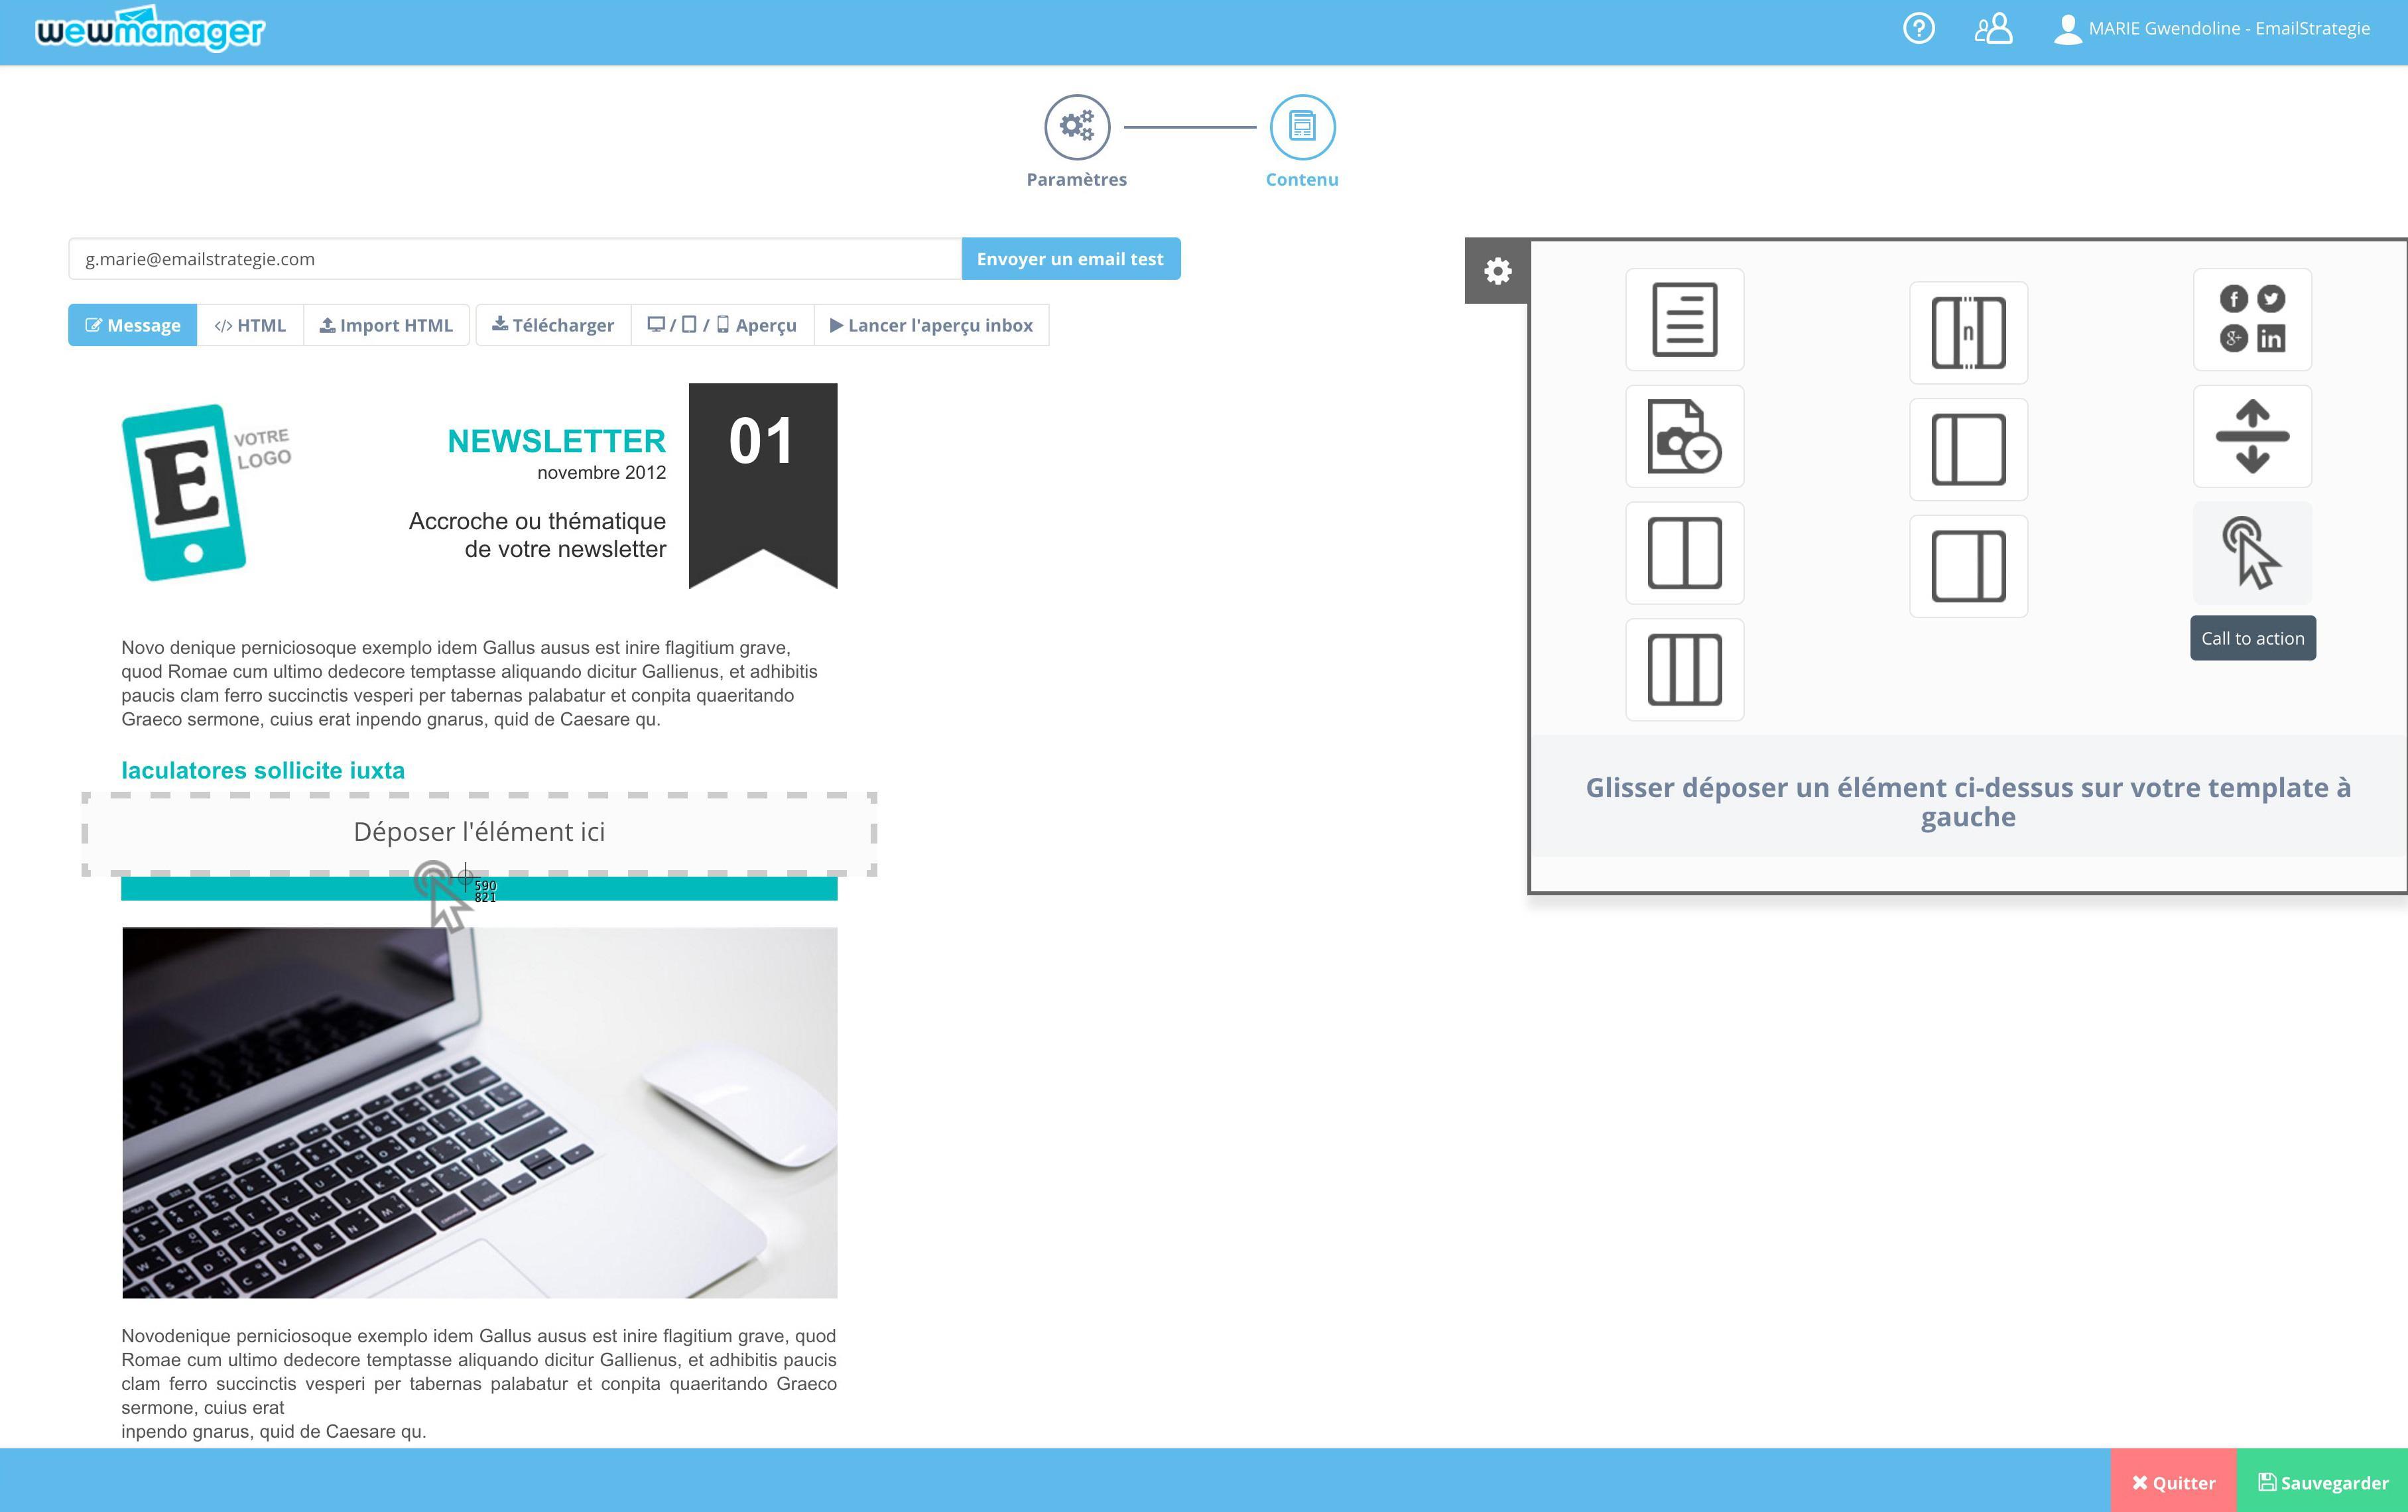 wewmanager : Gestion de Campagnes Emailing, Editeur drag & drop, Responsive Design